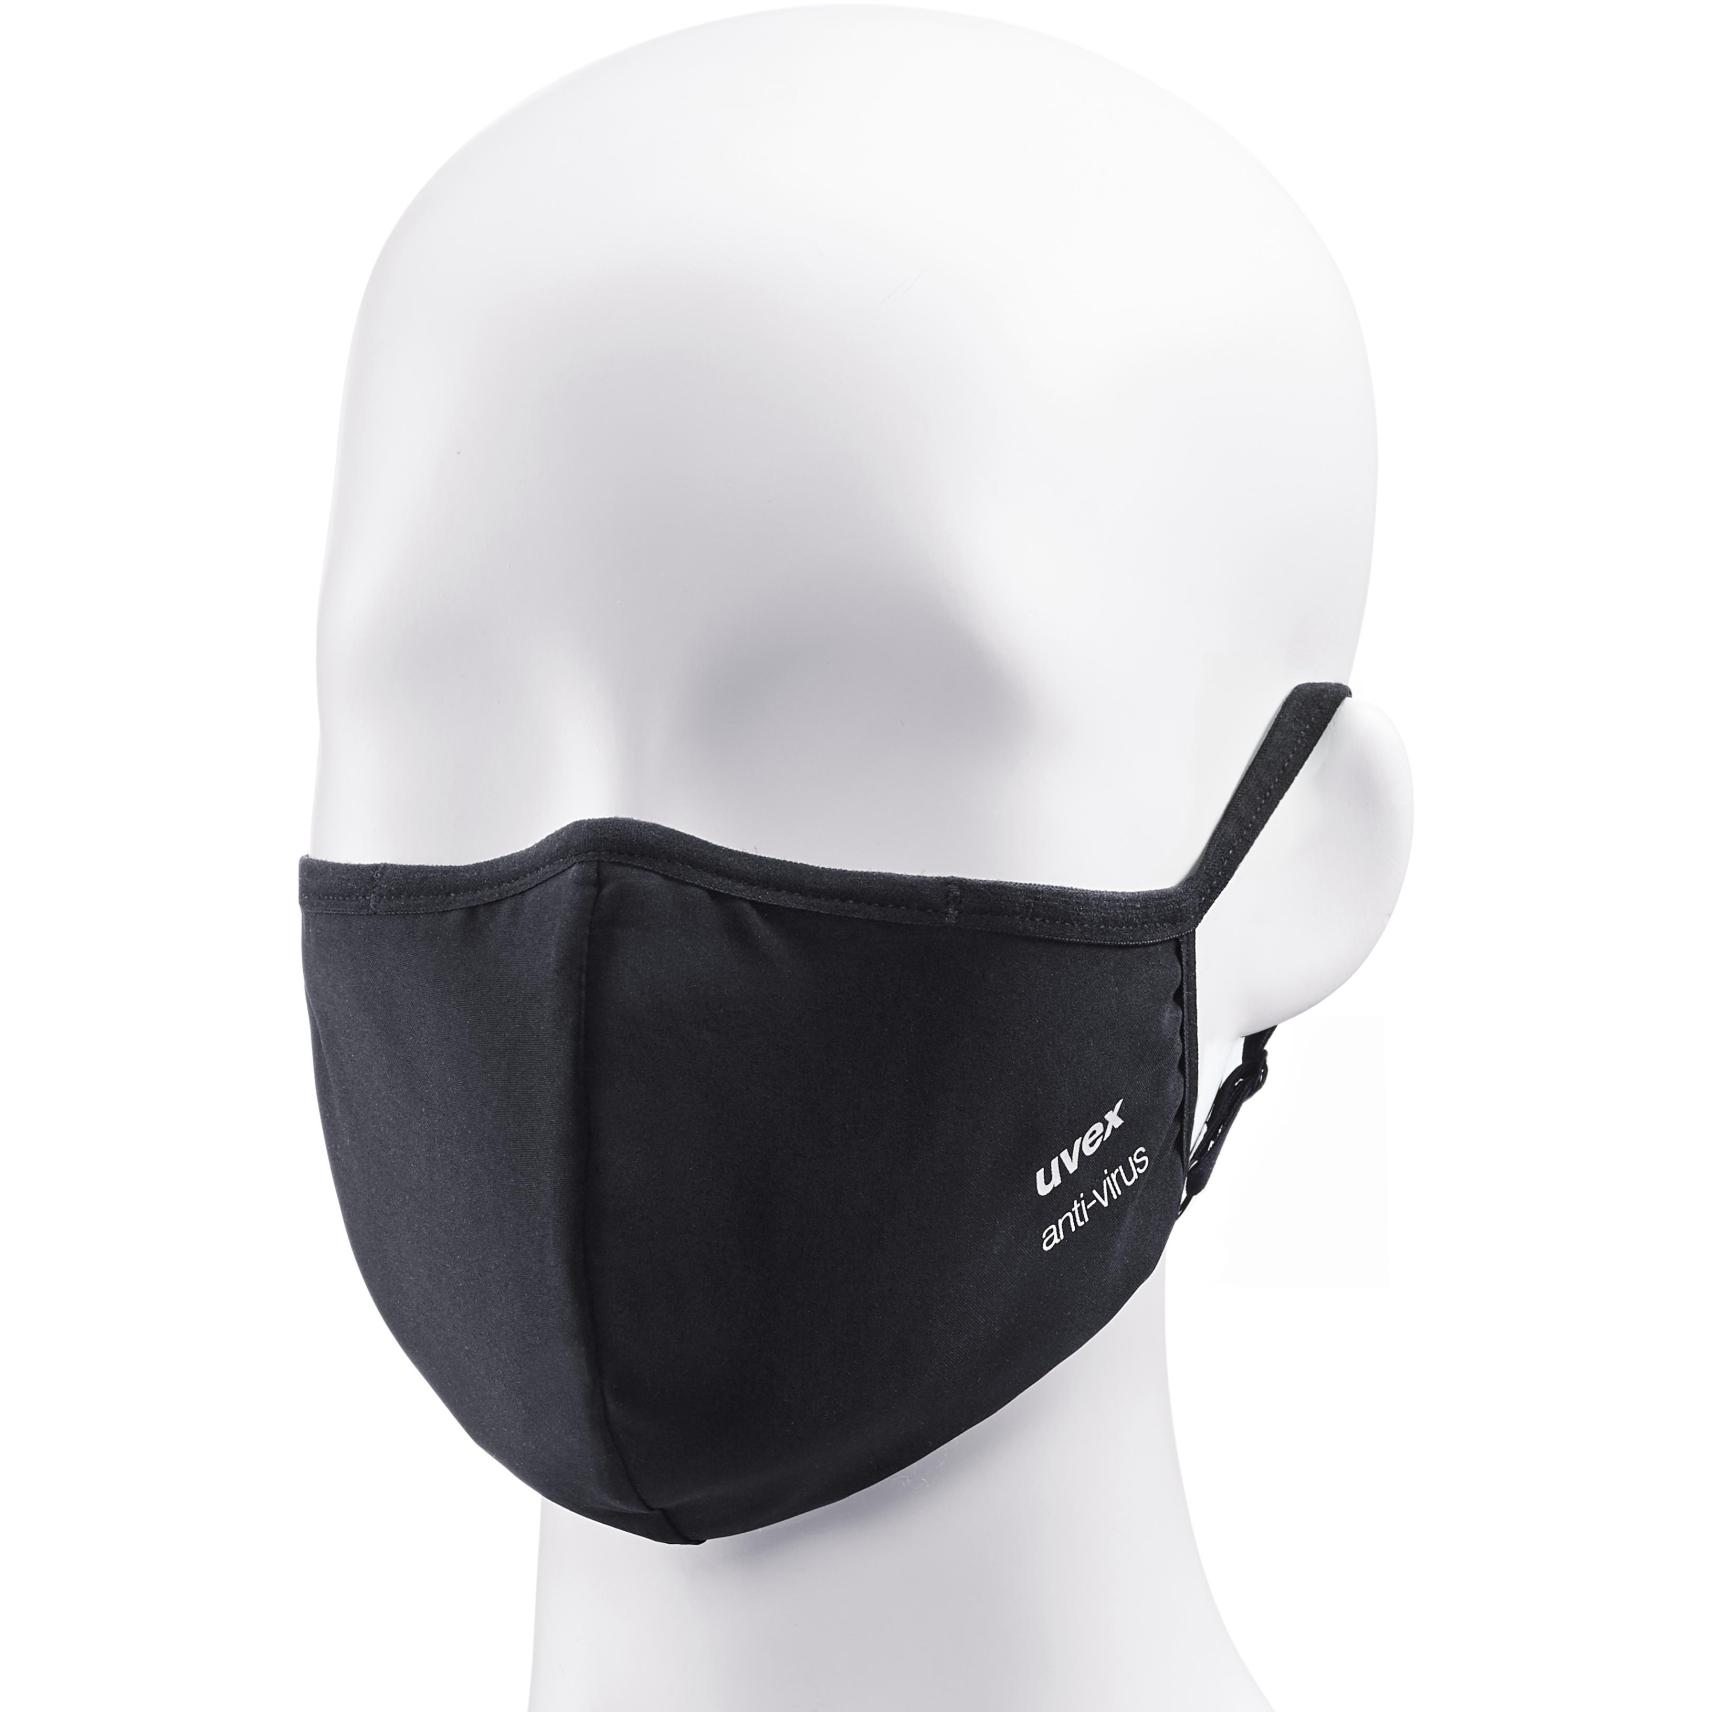 Image of Uvex anti-virus Face Mask - black